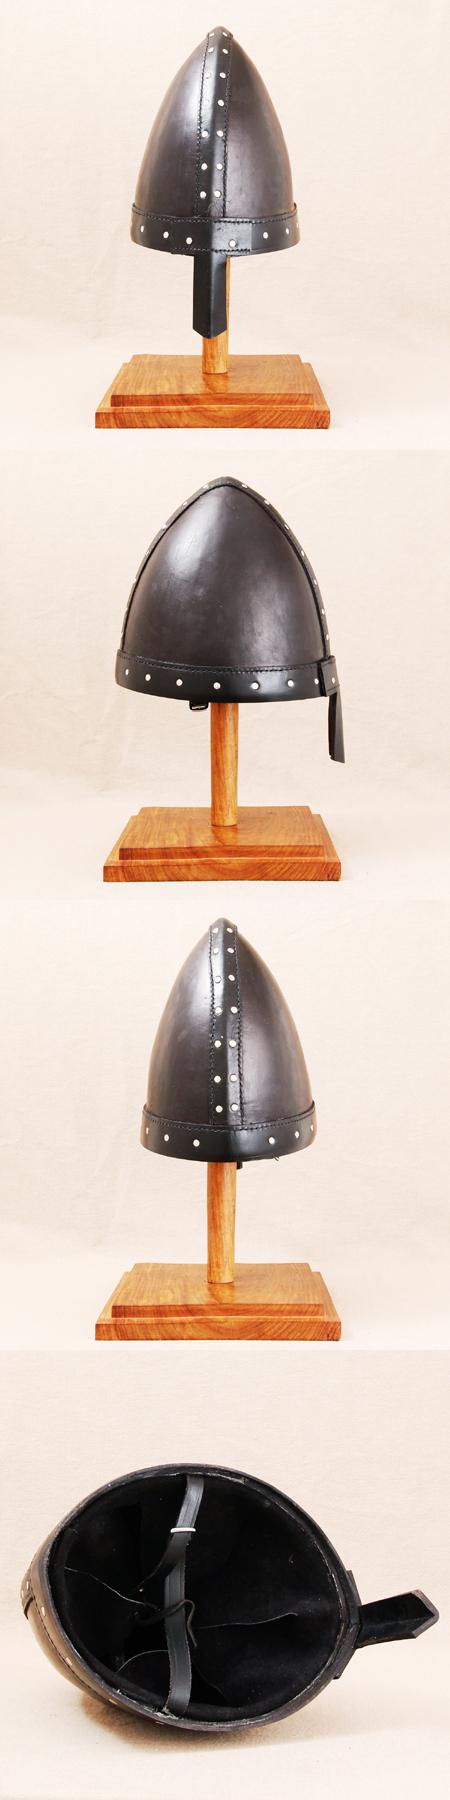 Norman or Viking Helmet w. nose guard